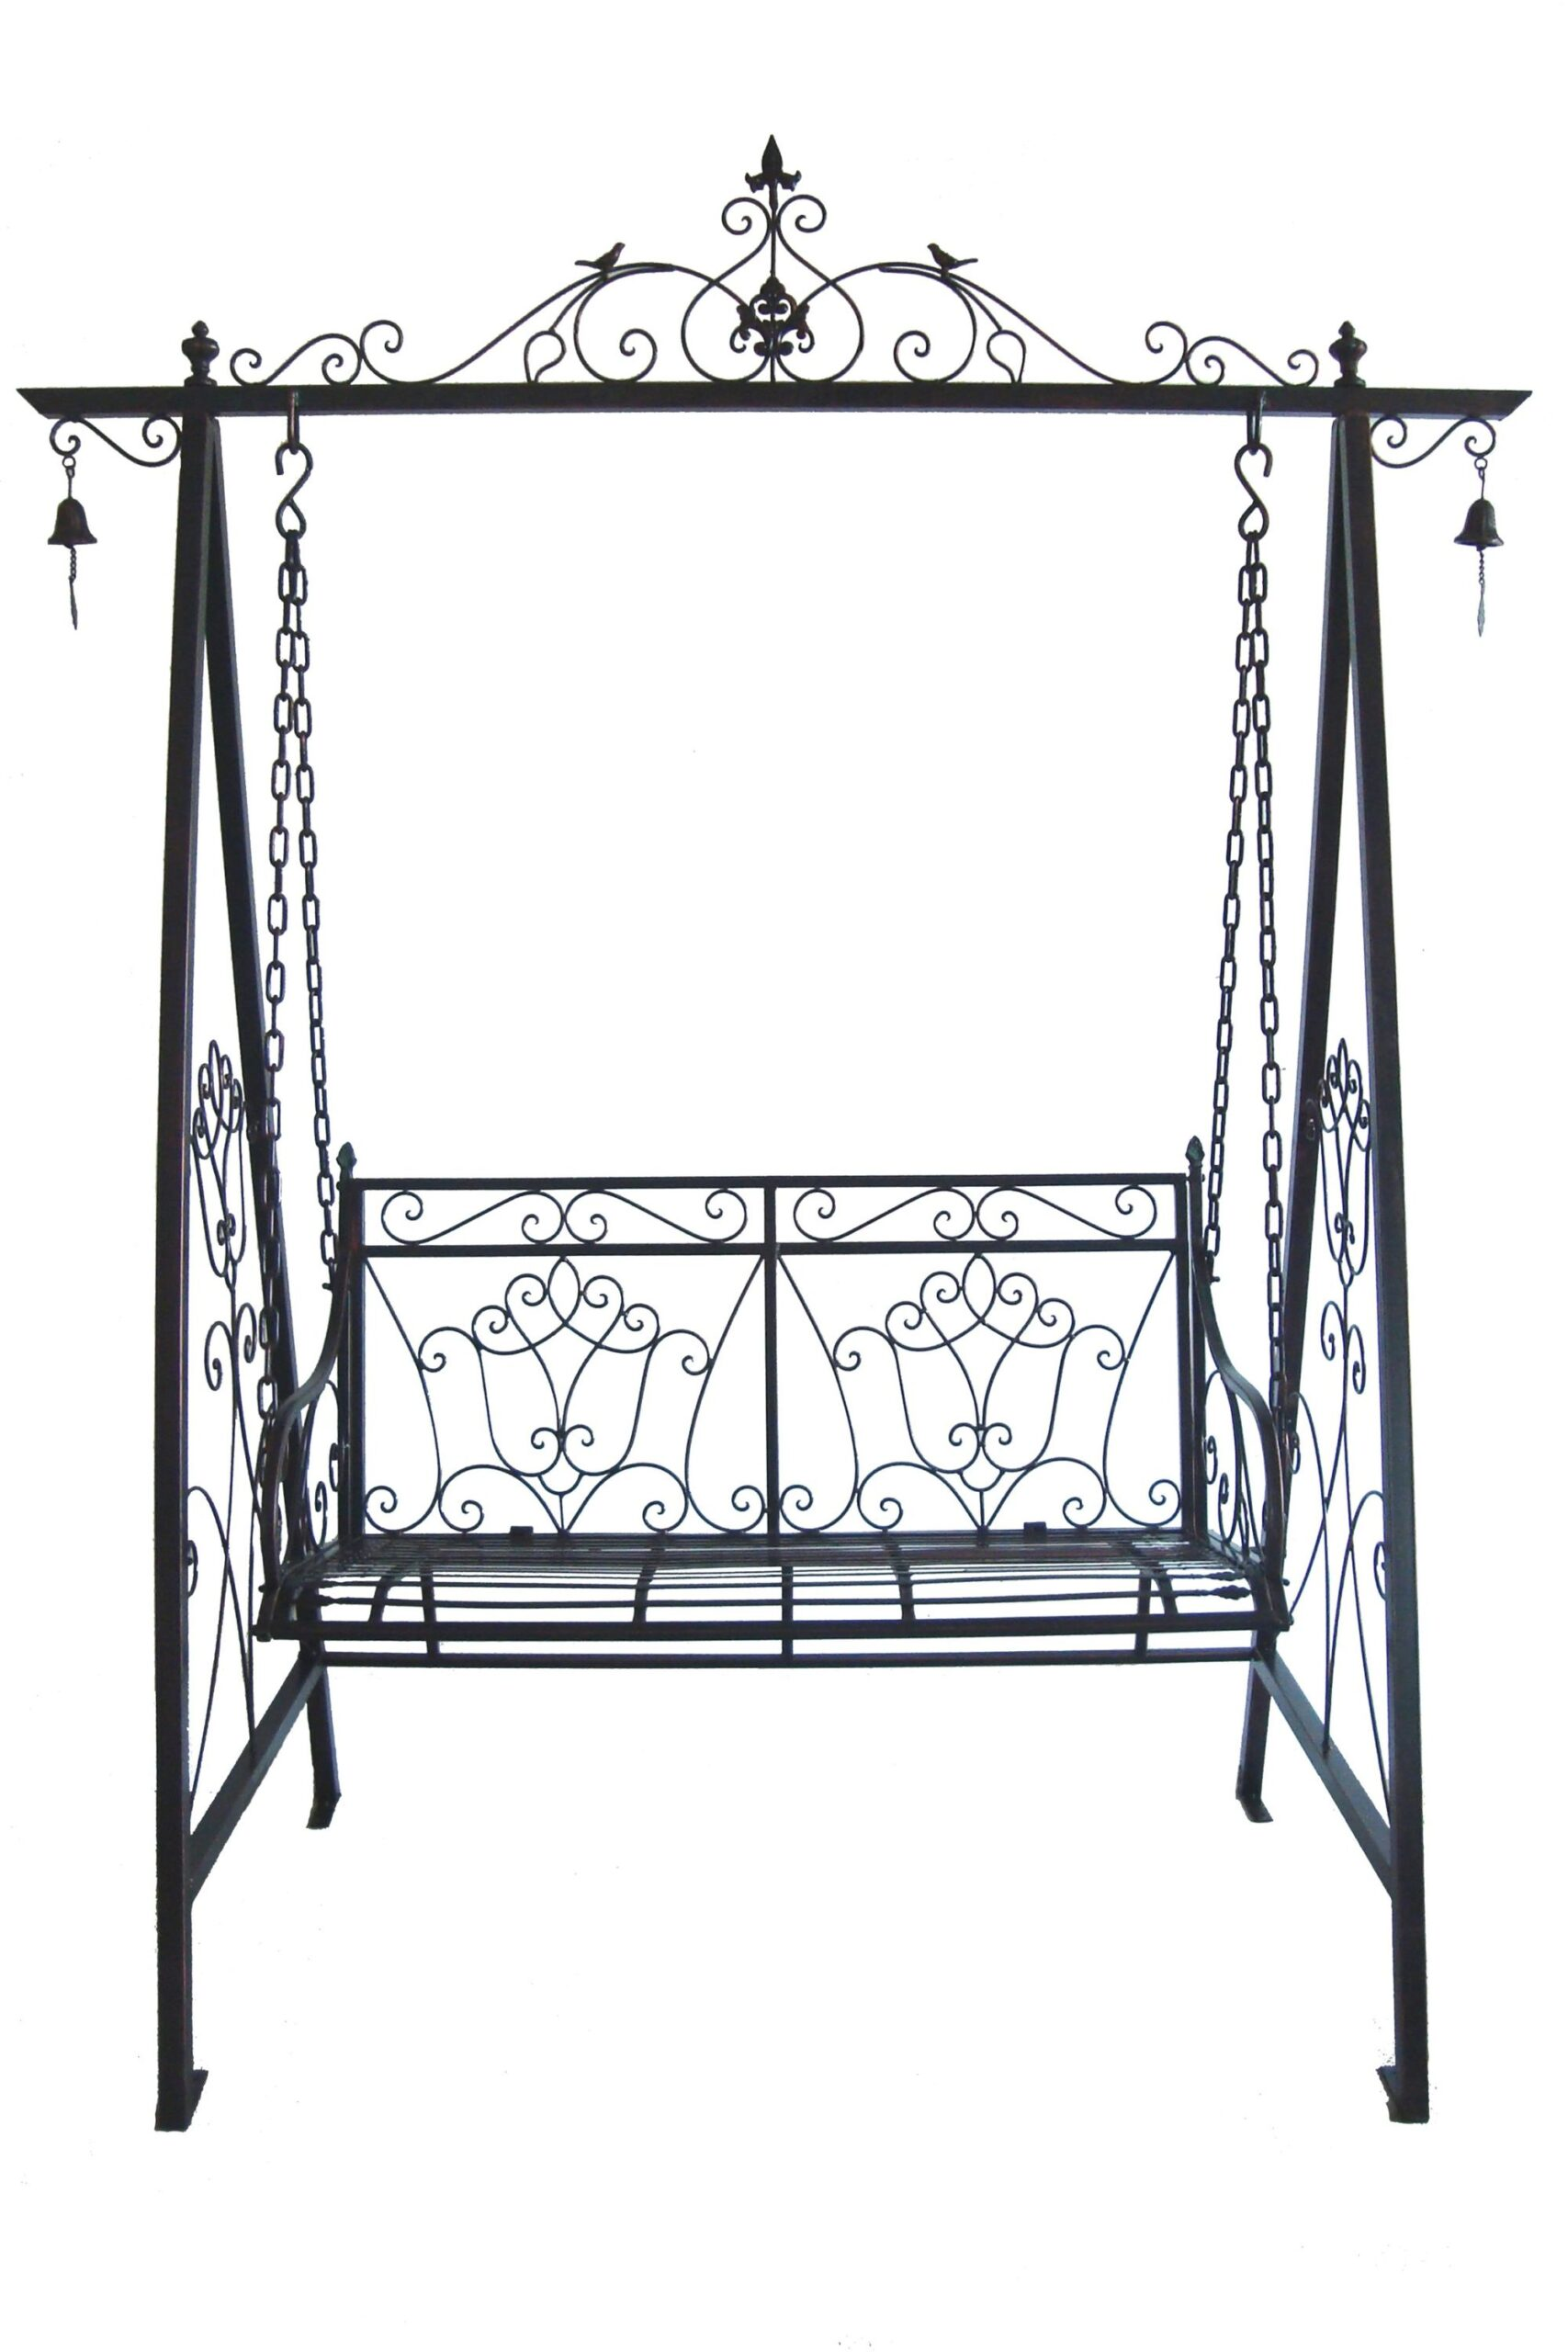 Full Size of Gartenschaukel Kinderschaukel Garten Regal Metall Bett Weiß Schaukelstuhl Schaukel Regale Für Wohnzimmer Schaukel Metall Erwachsene